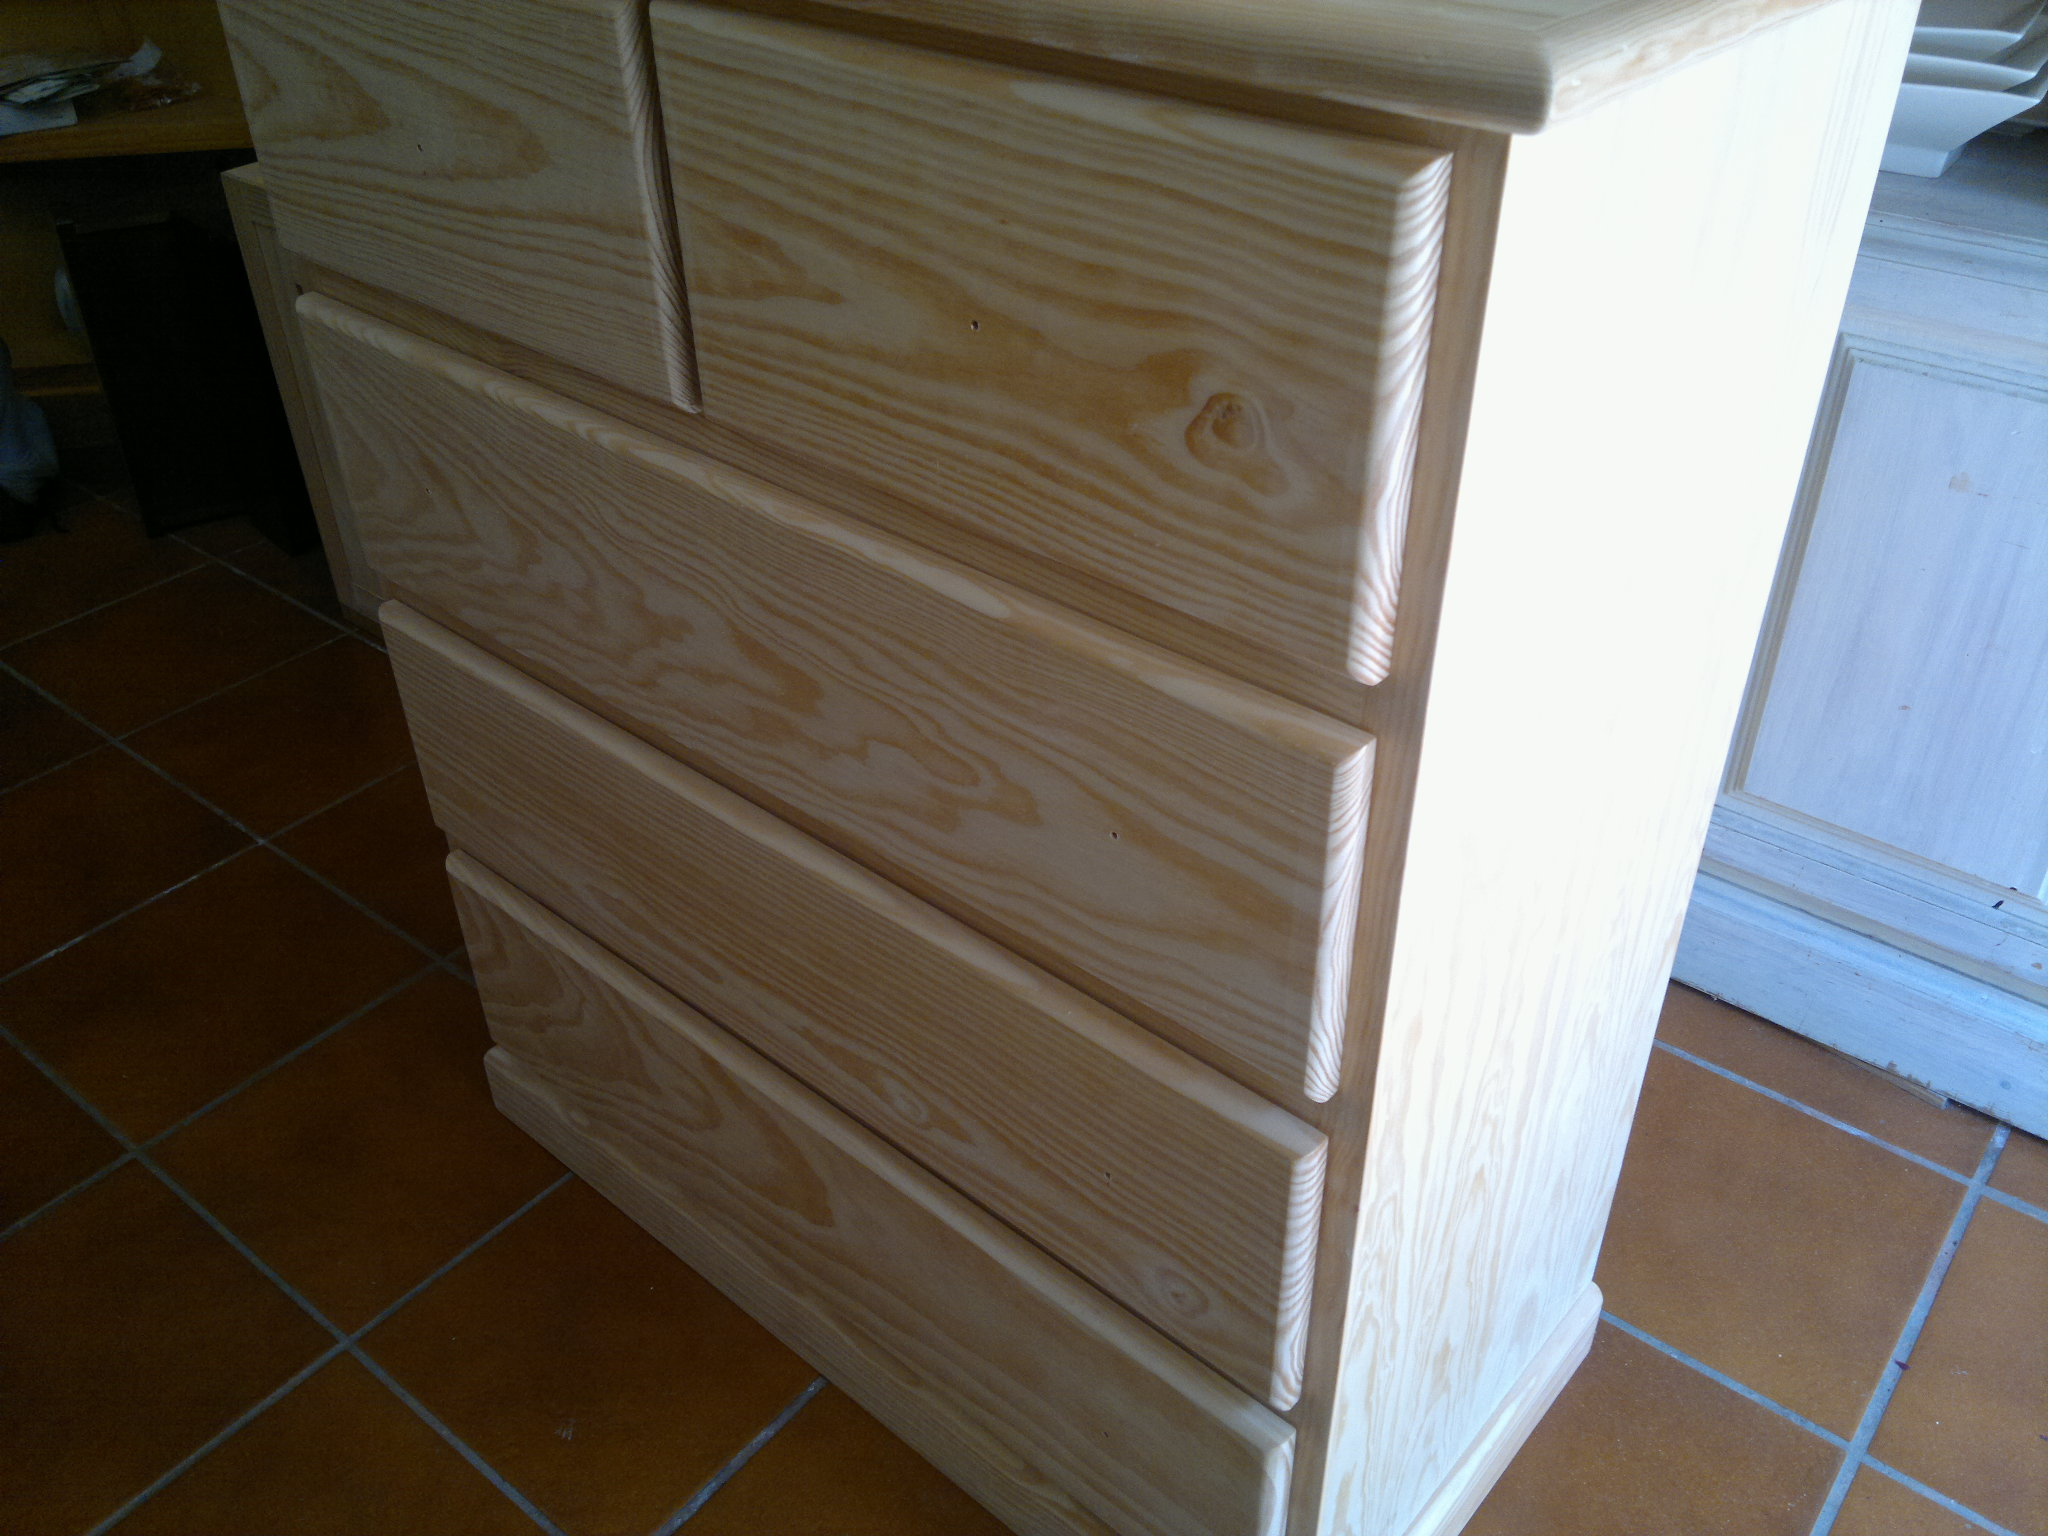 Pintar Mueble De Pino Simple Perfect Muebles Pino Jose Leon  # Muebles Sin Barnizar